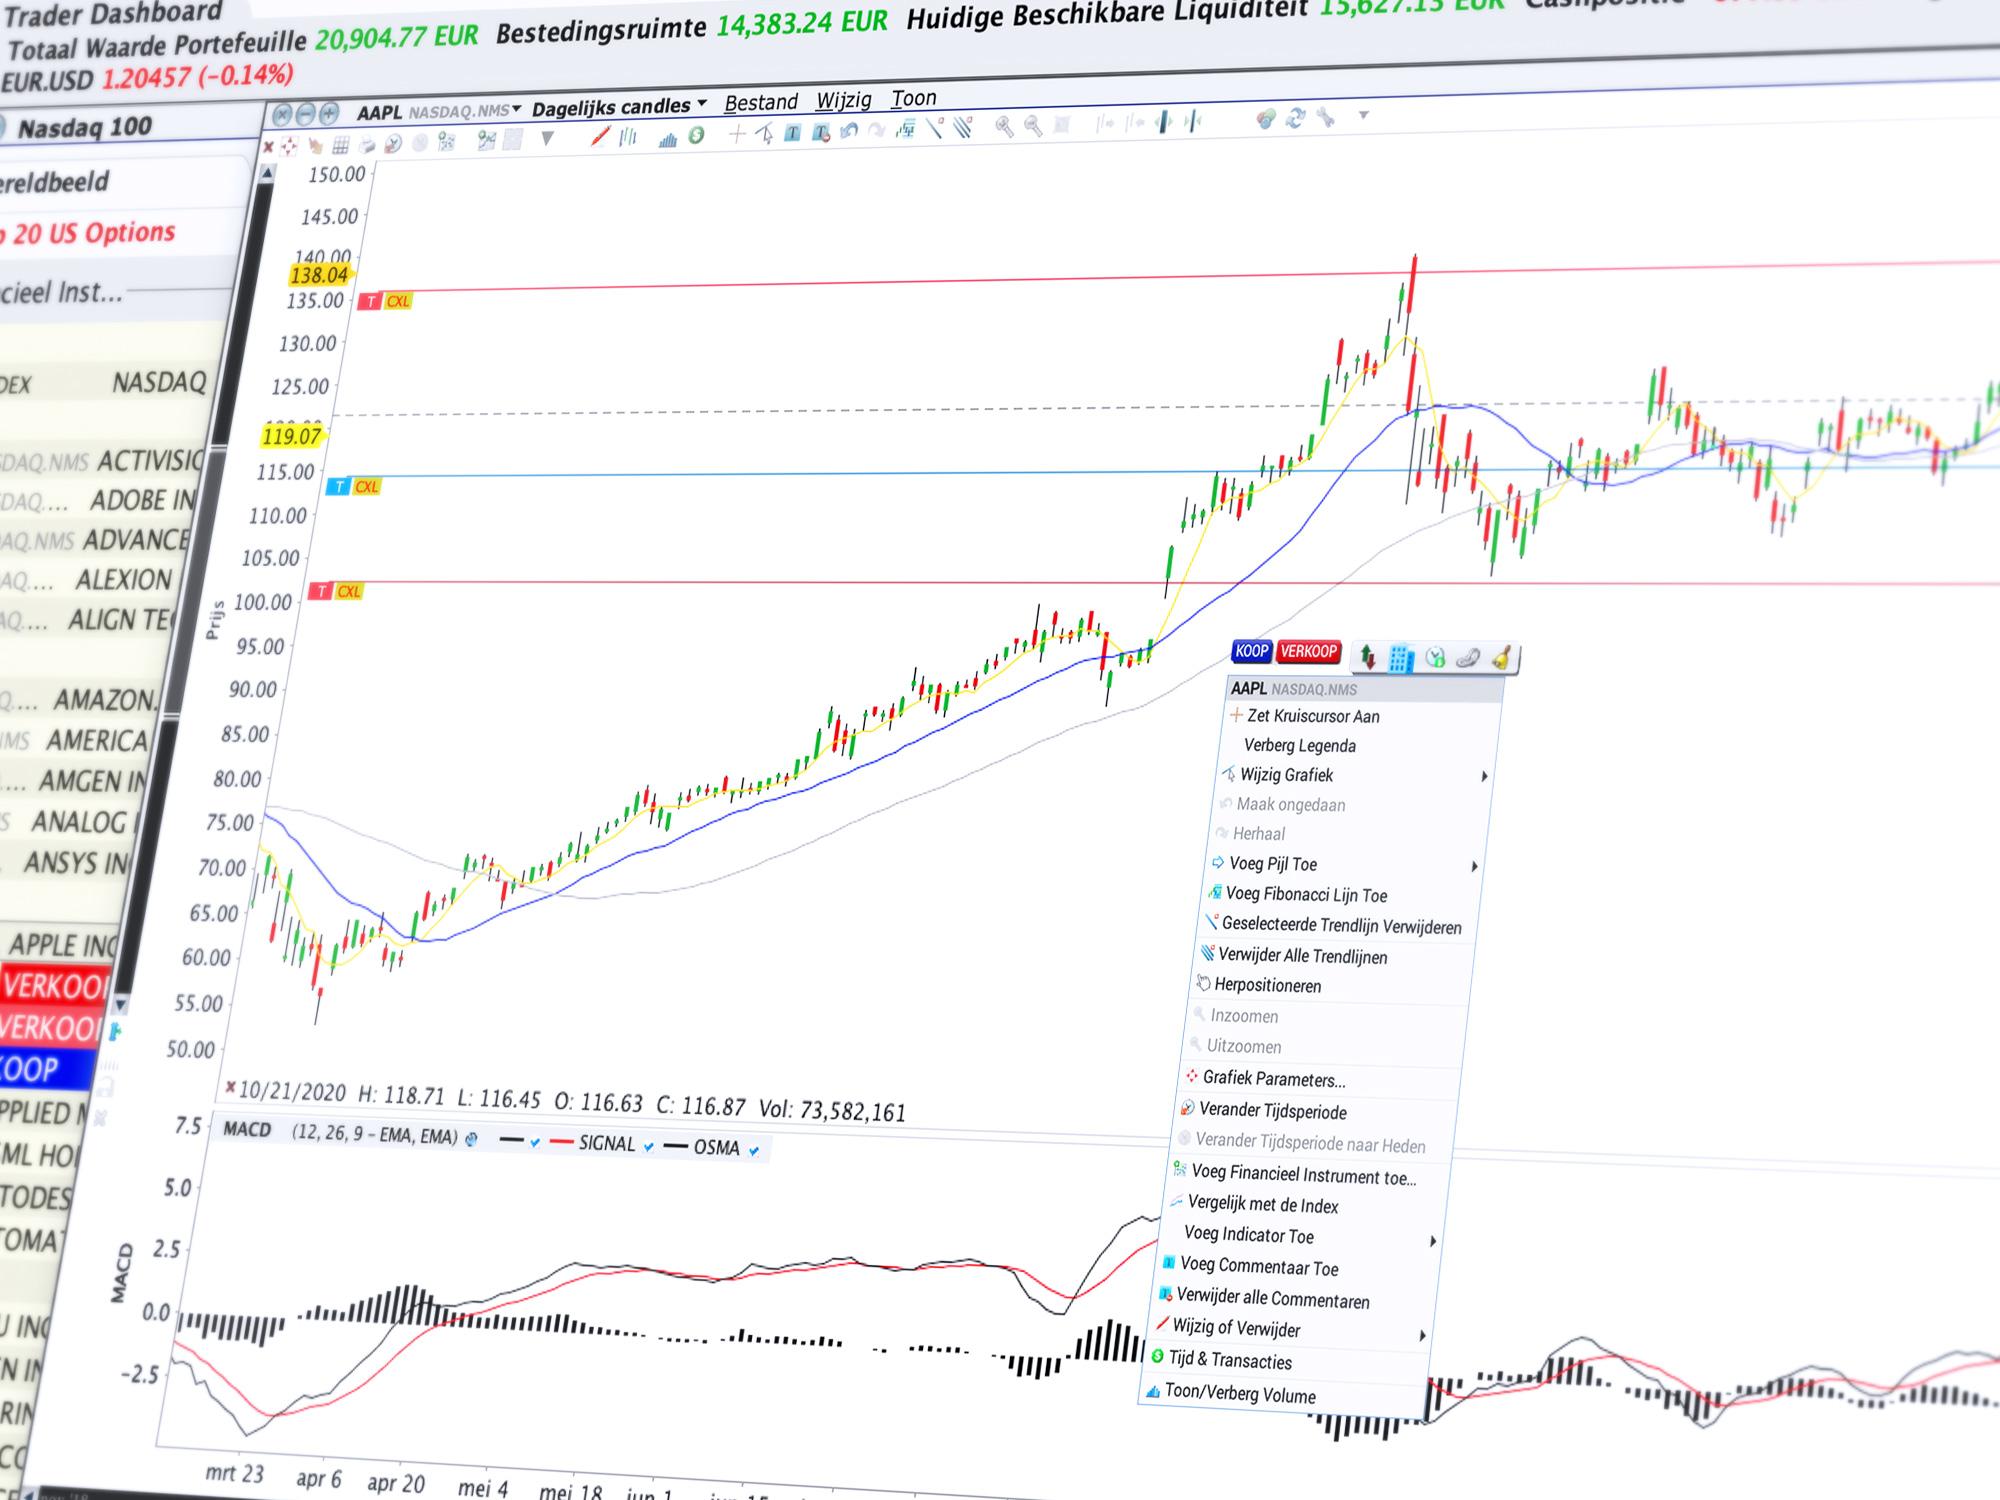 Aandelen handelen: aandelen handelen direct in de grafiek